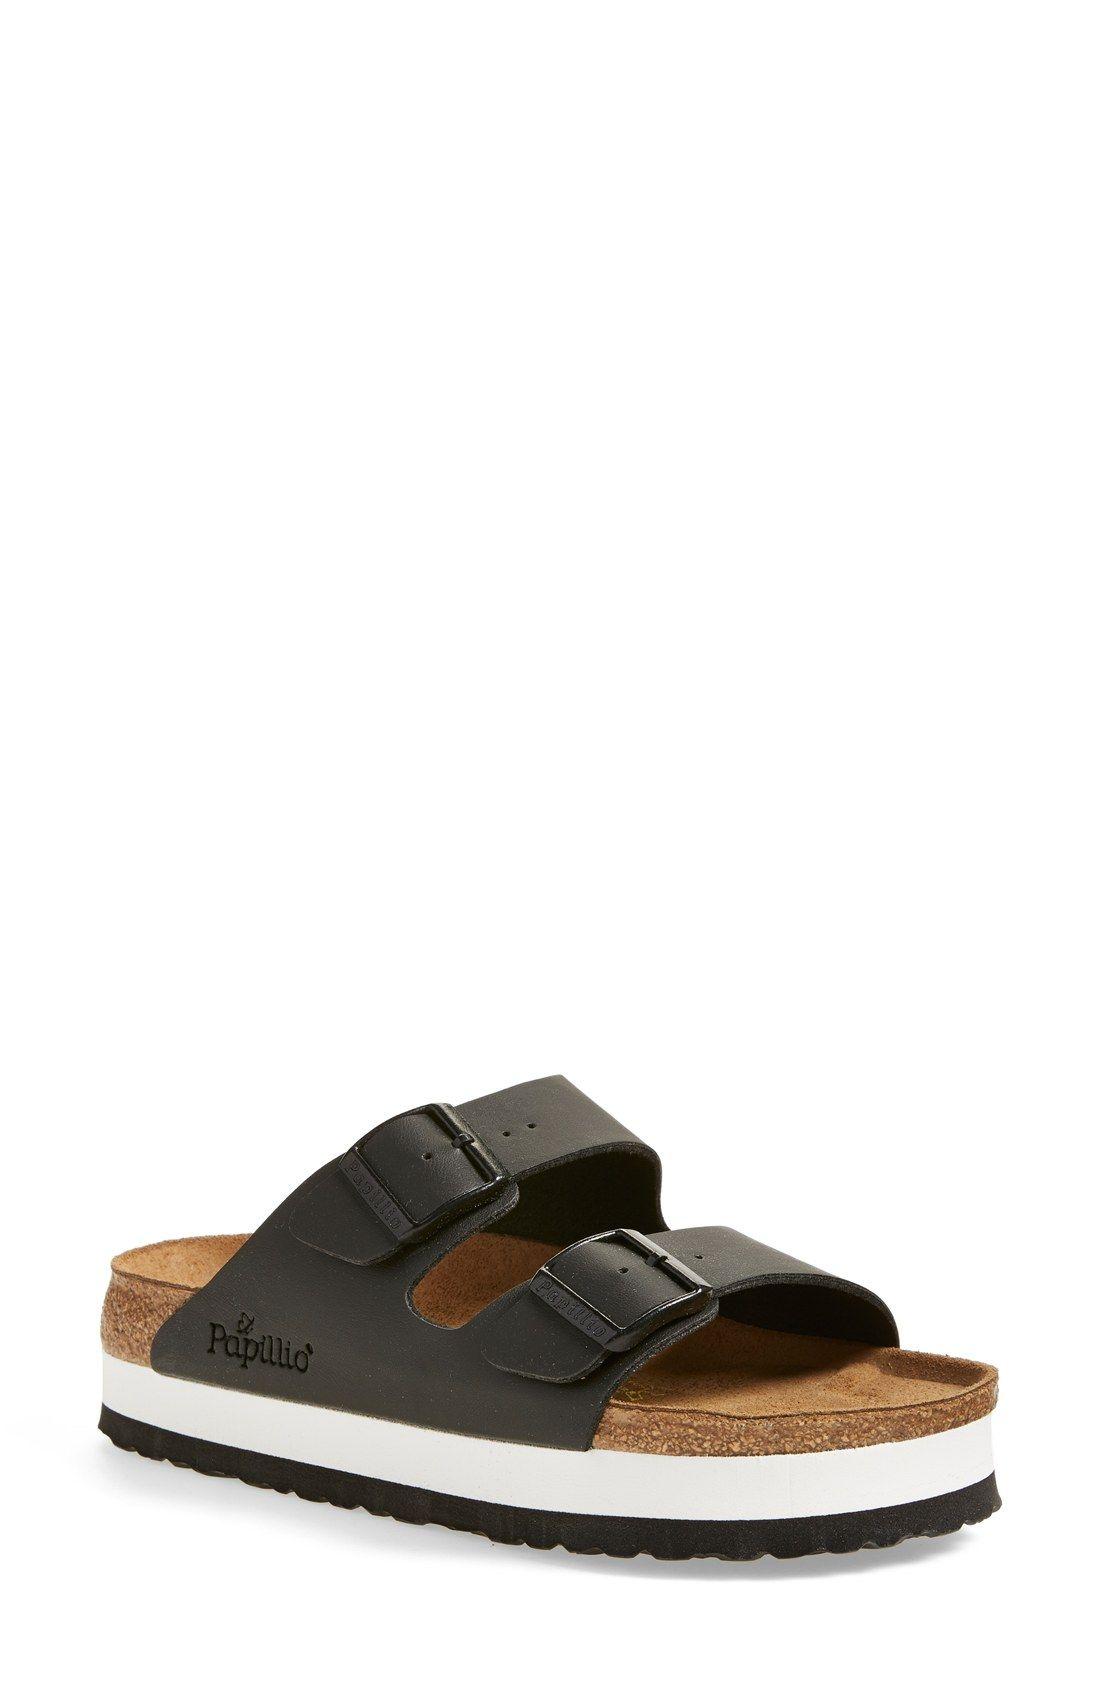 913df6b0ab77 Papillio by Birkenstock  Arizona - Birko-Flor  Platform Sandal (Women)